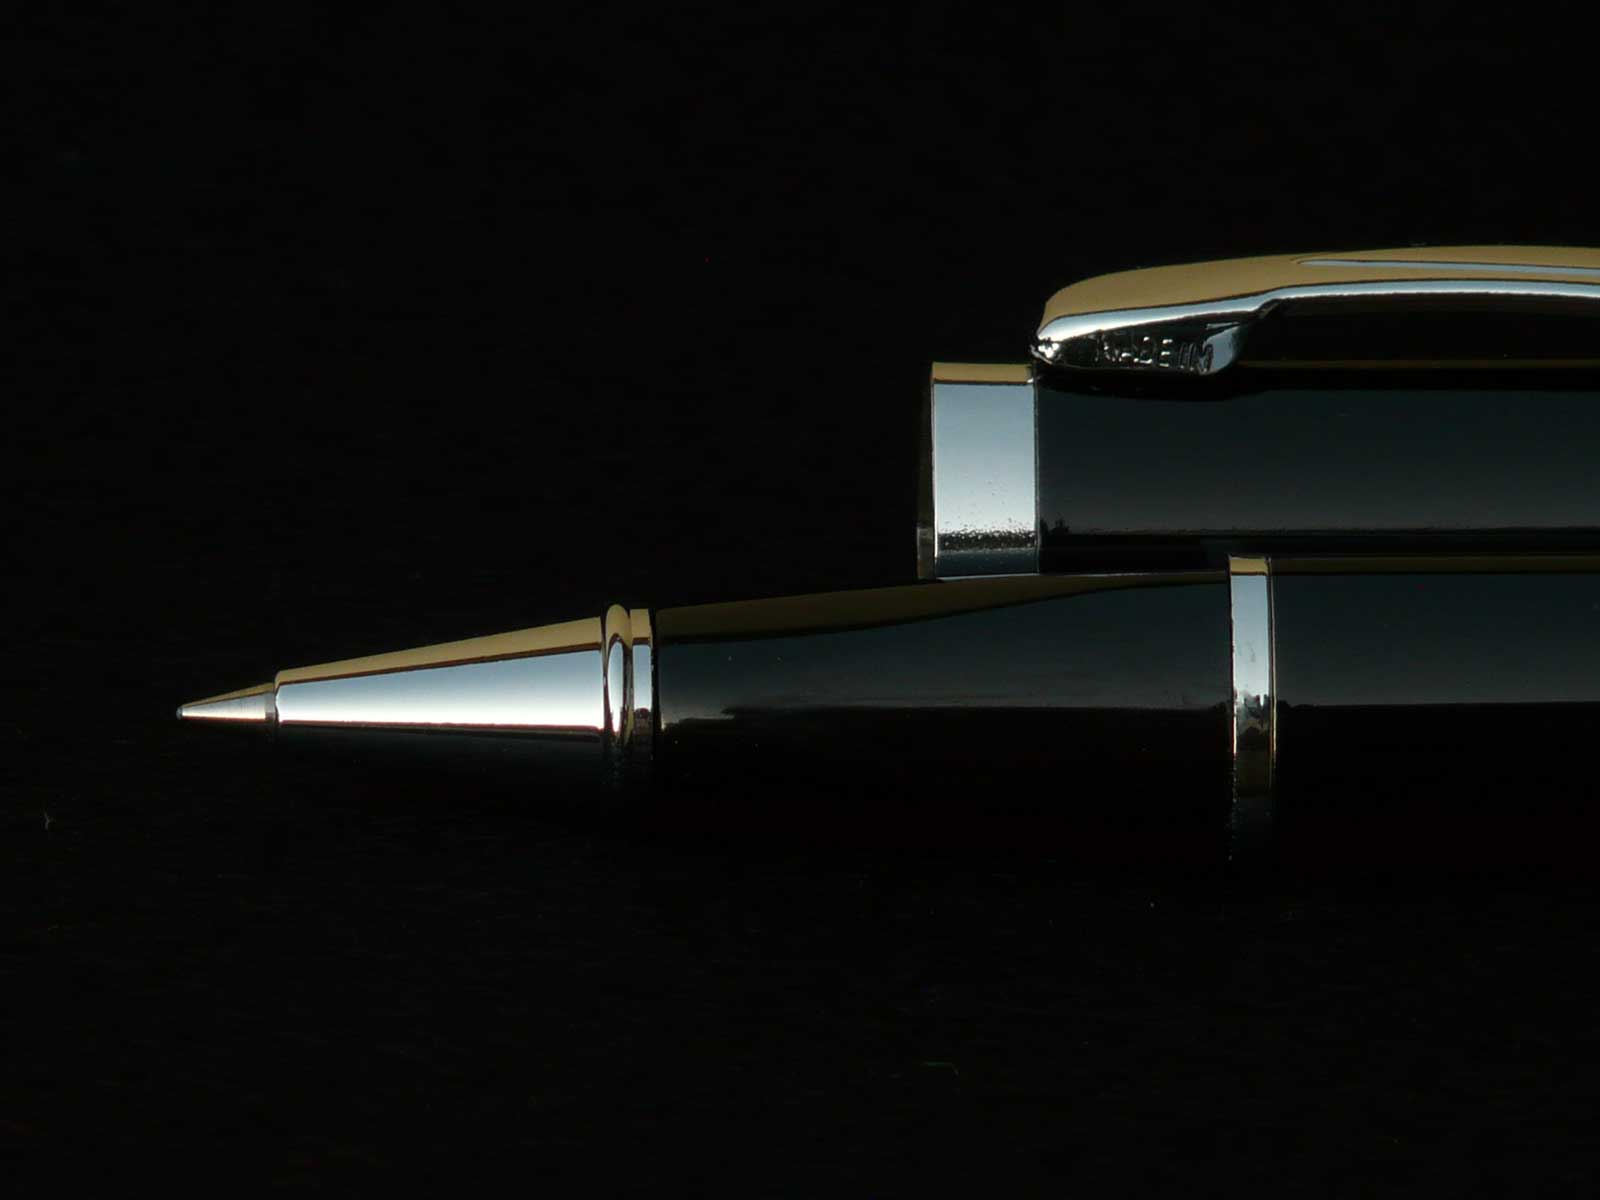 A black ballpoint pen